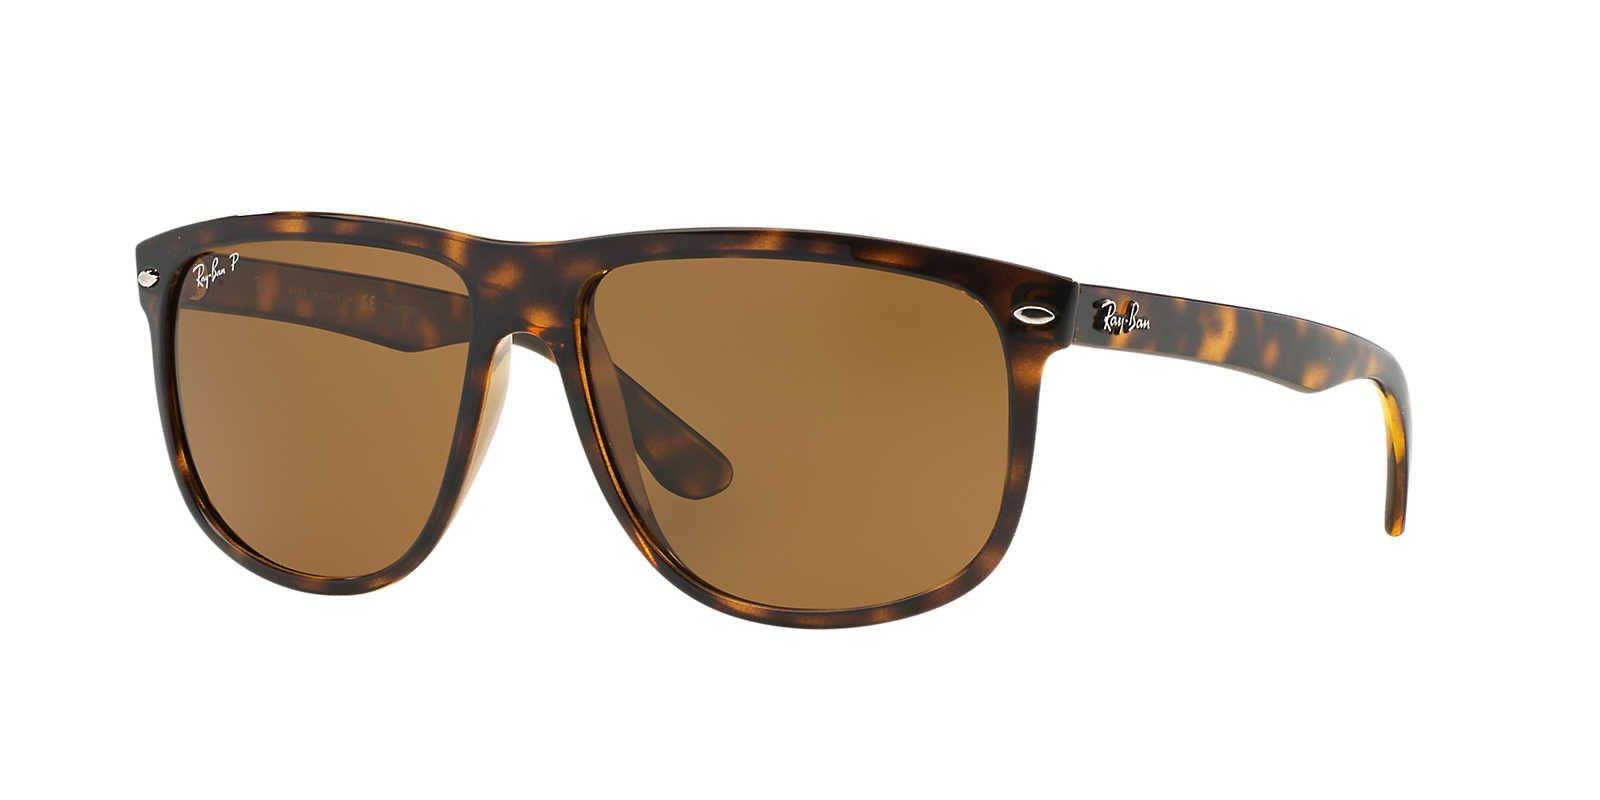 Ray-Ban Mens Sunglasses (RB4147) Tortoise/Brown Plastic,Nylon - Polarized - 60mm